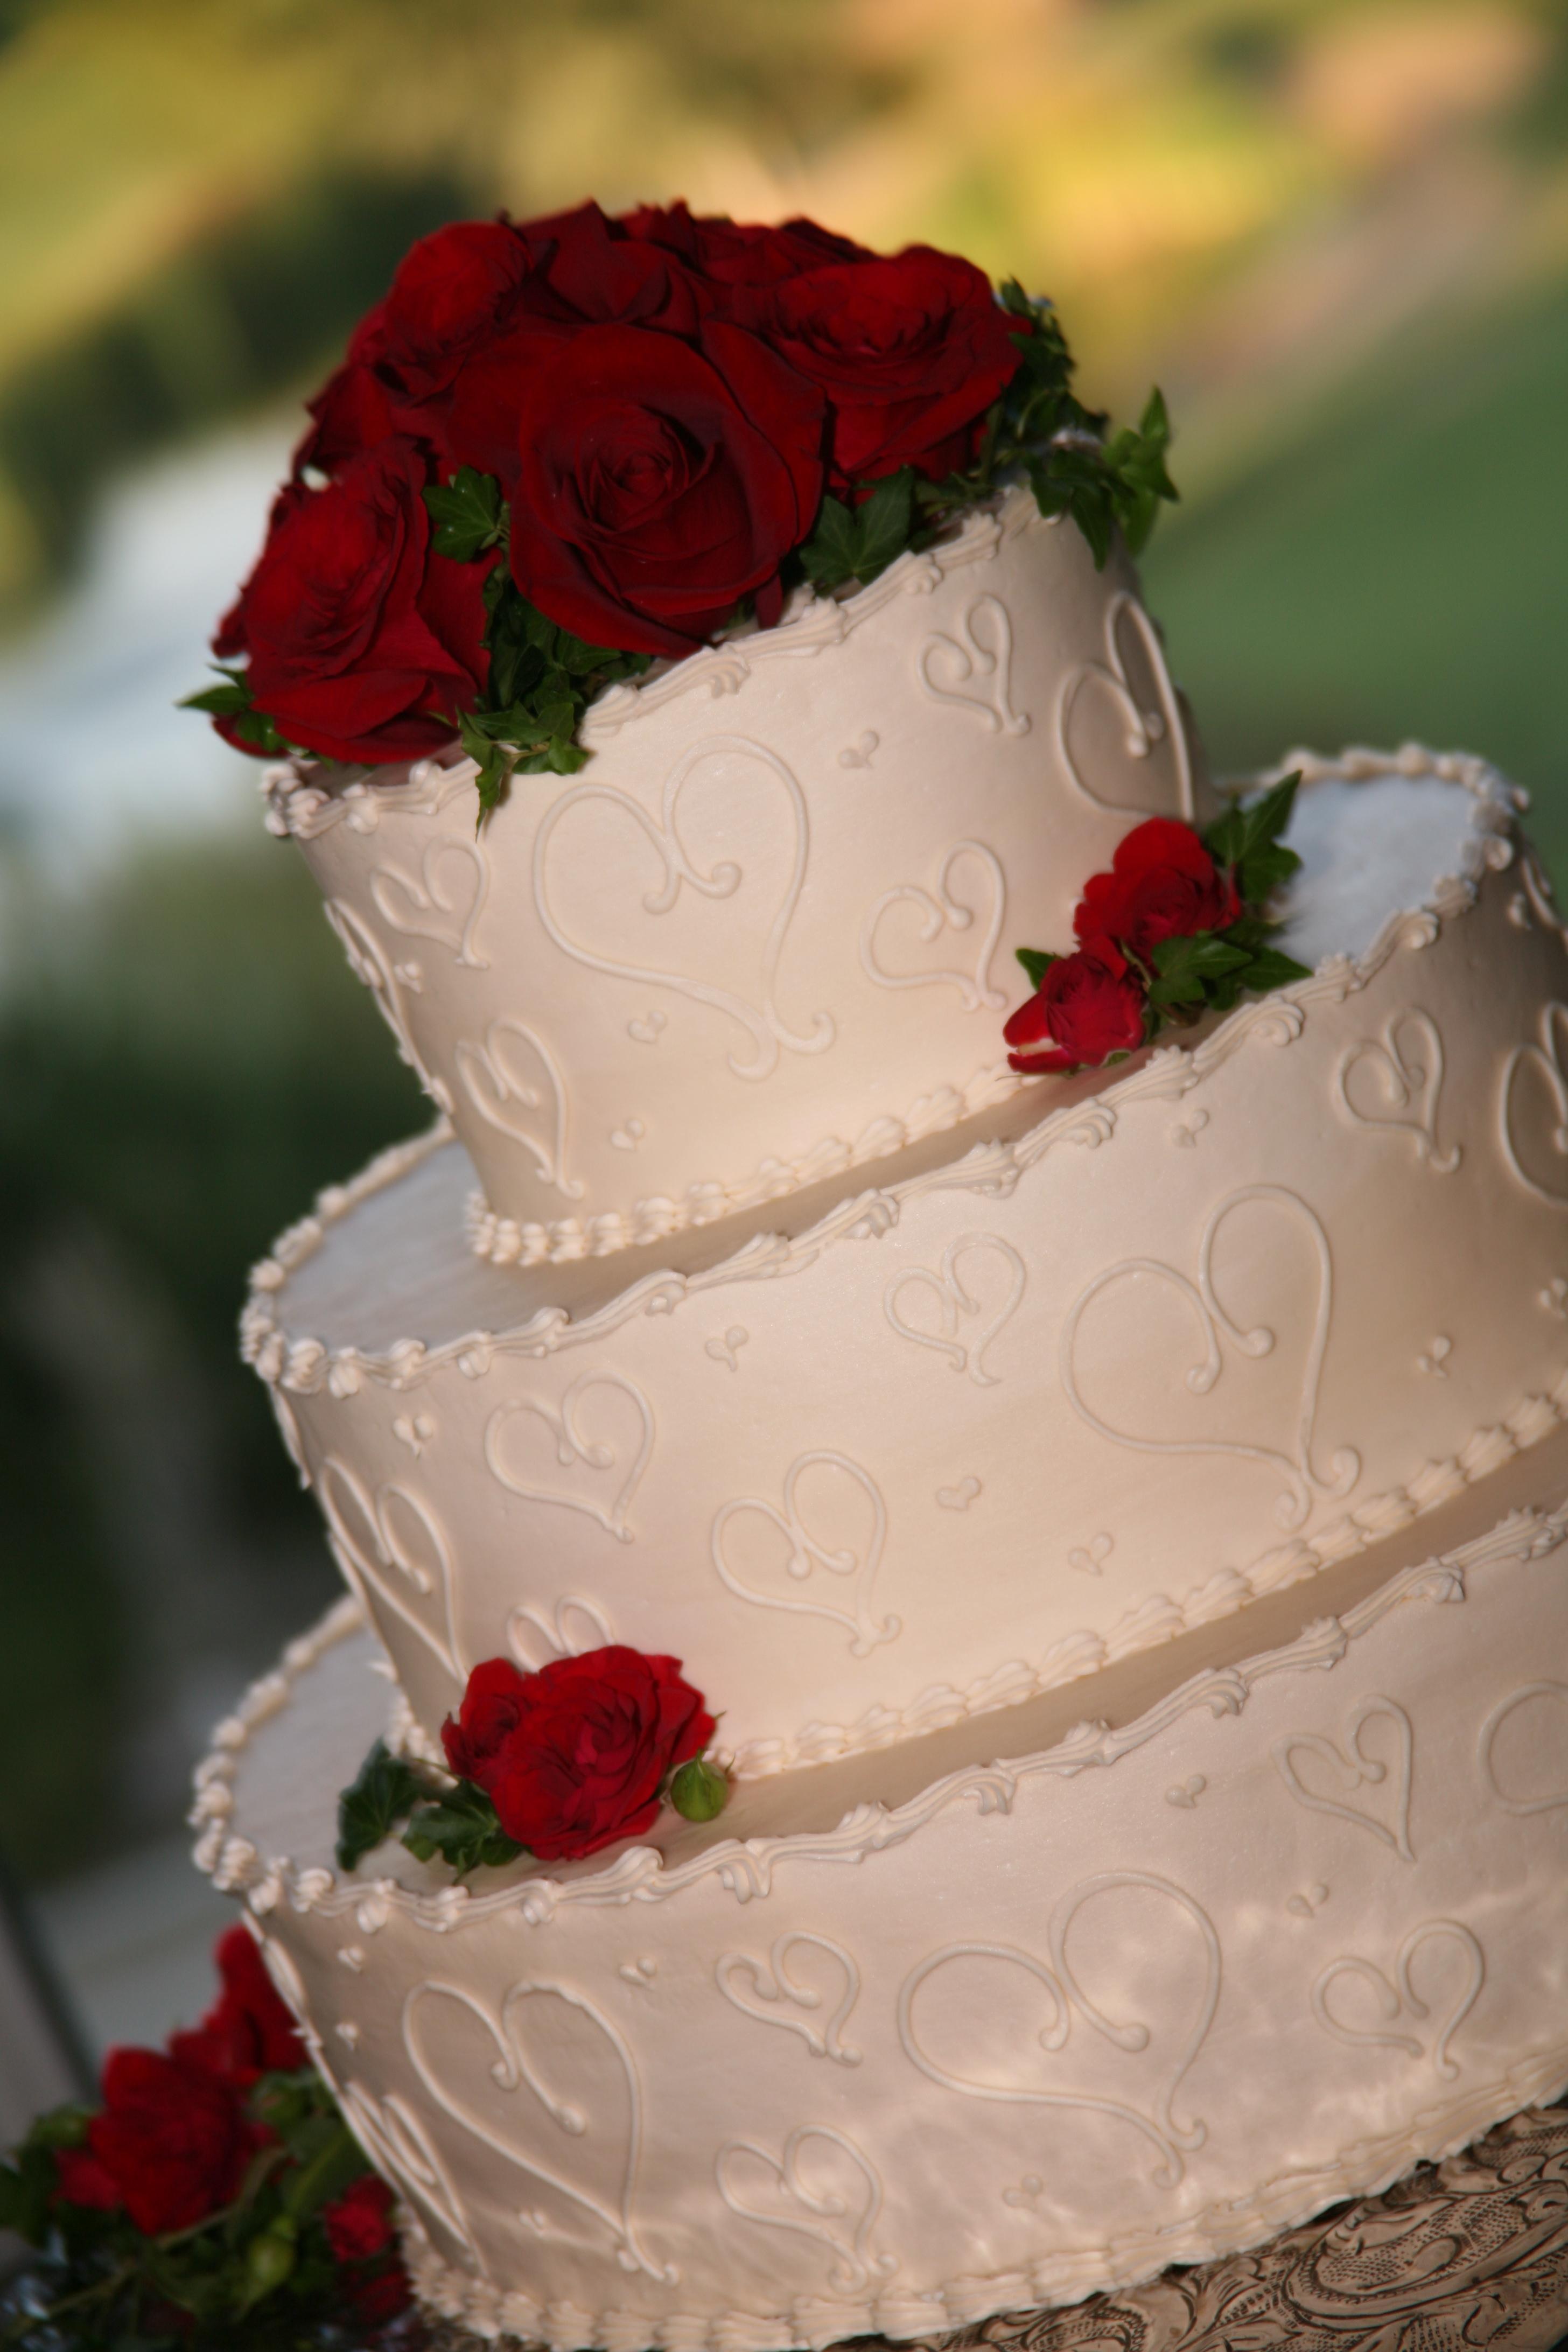 Reception, Flowers & Decor, Photography, Wedding, Photographer, Events, Engagement, Norman azzara photography